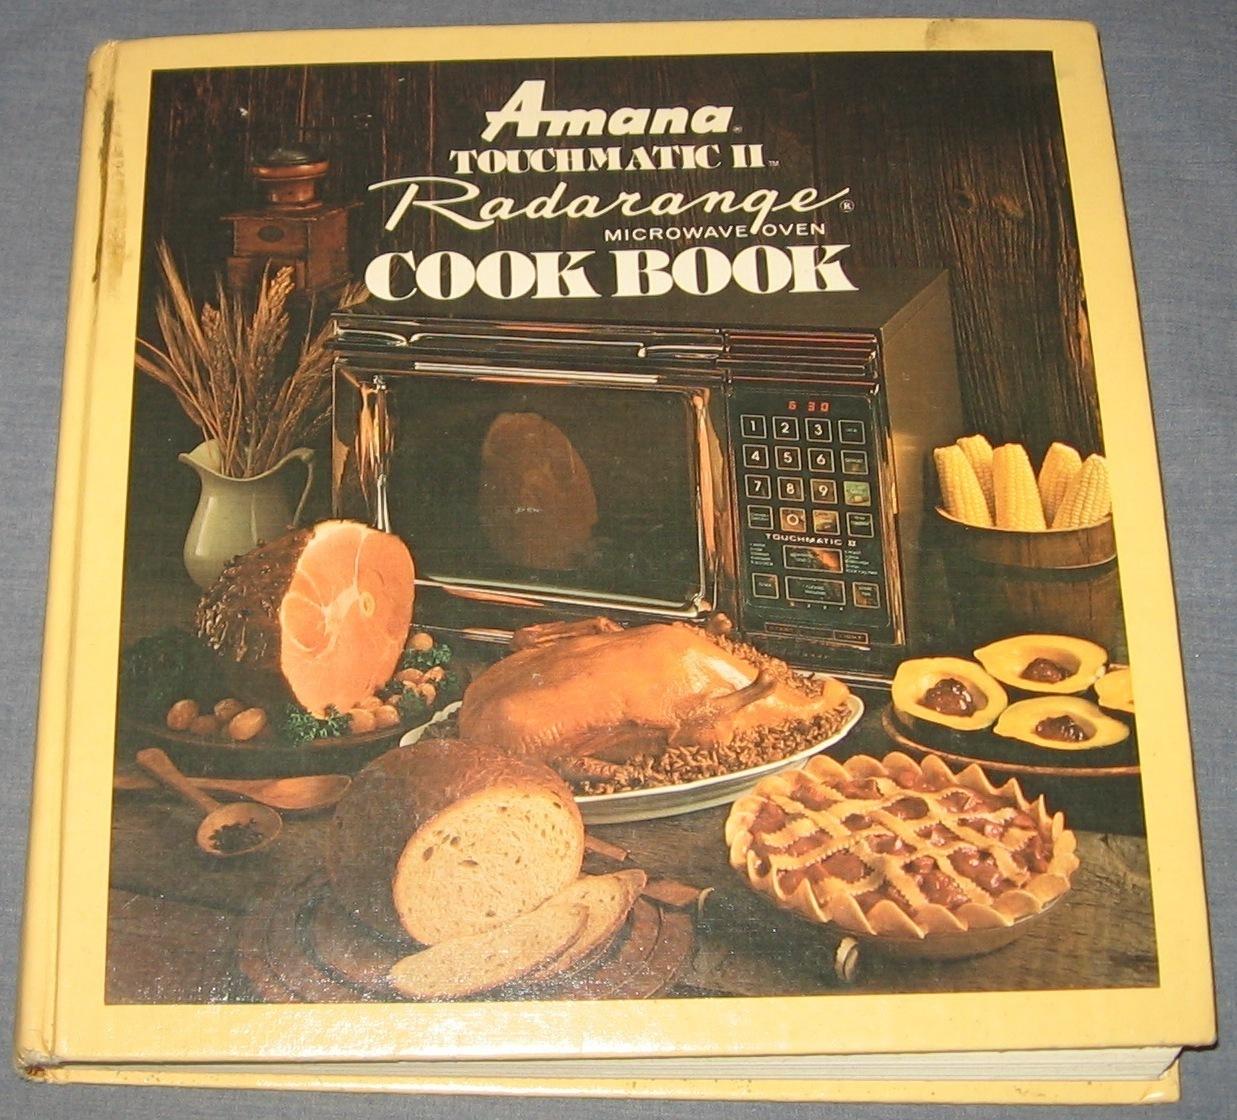 Amana Radarange Touchmatic Microwave Oven 1978: Amana Touchmatic II Radarange Microwave Oven Cookbook